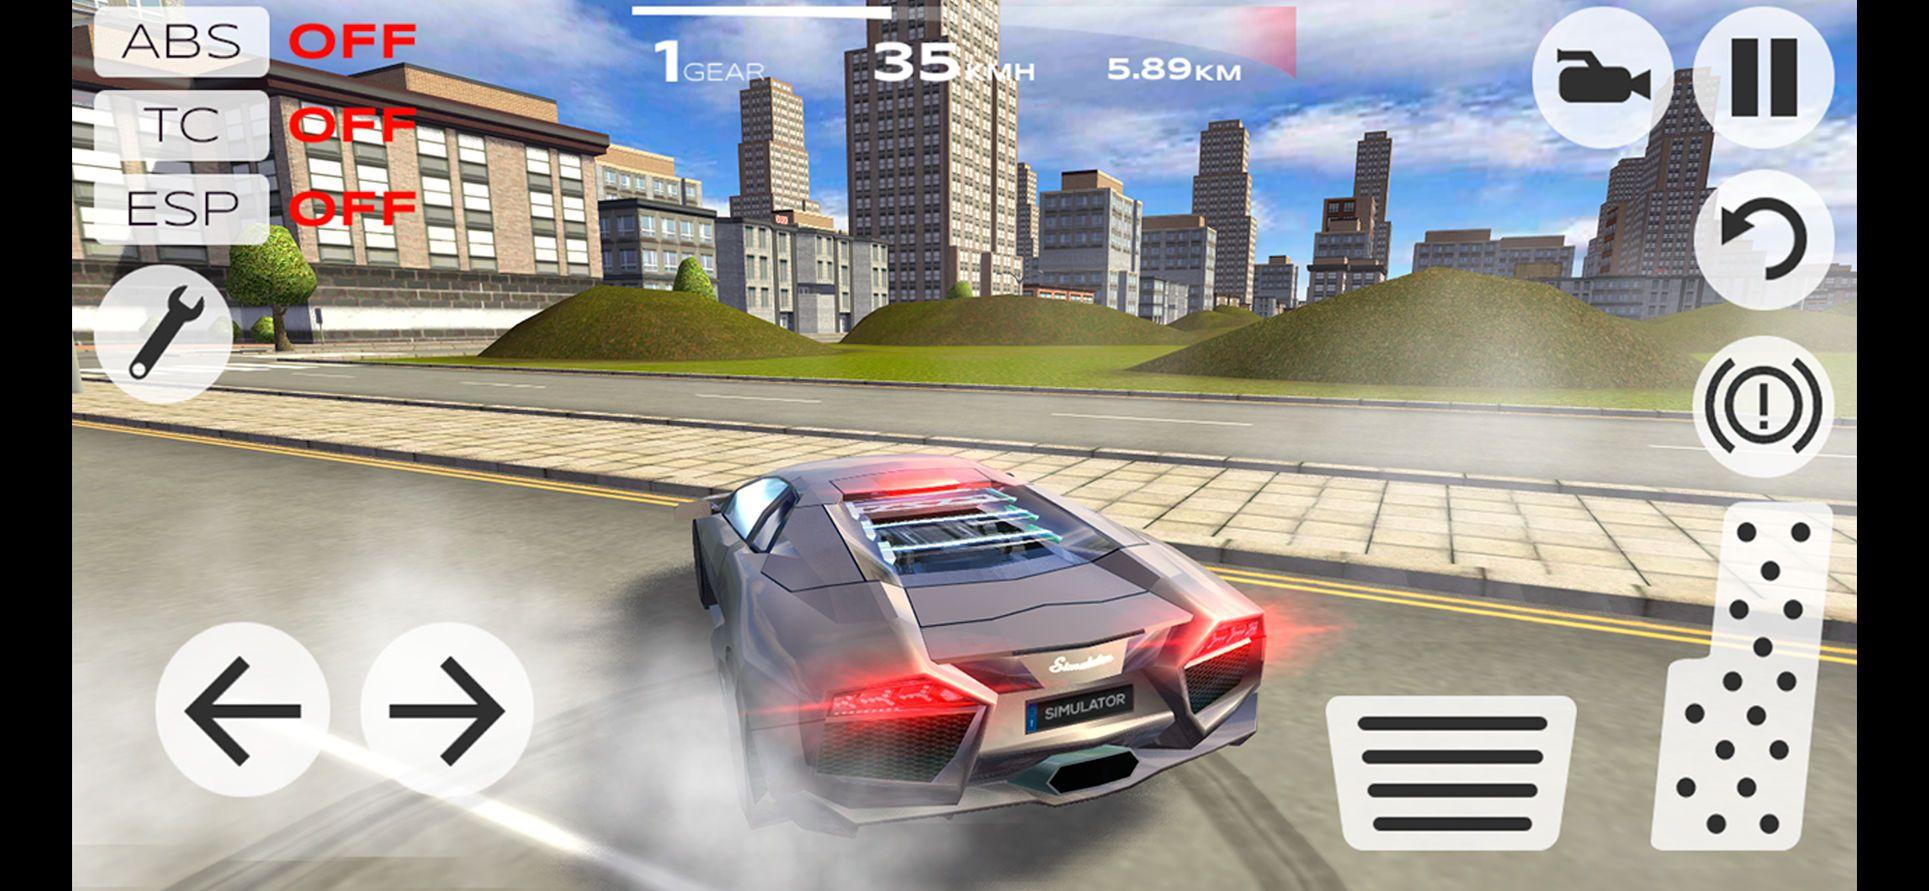 Extreme Car Driving Simulator Sports Games Racing Ios Driving Simulator Simulation Car